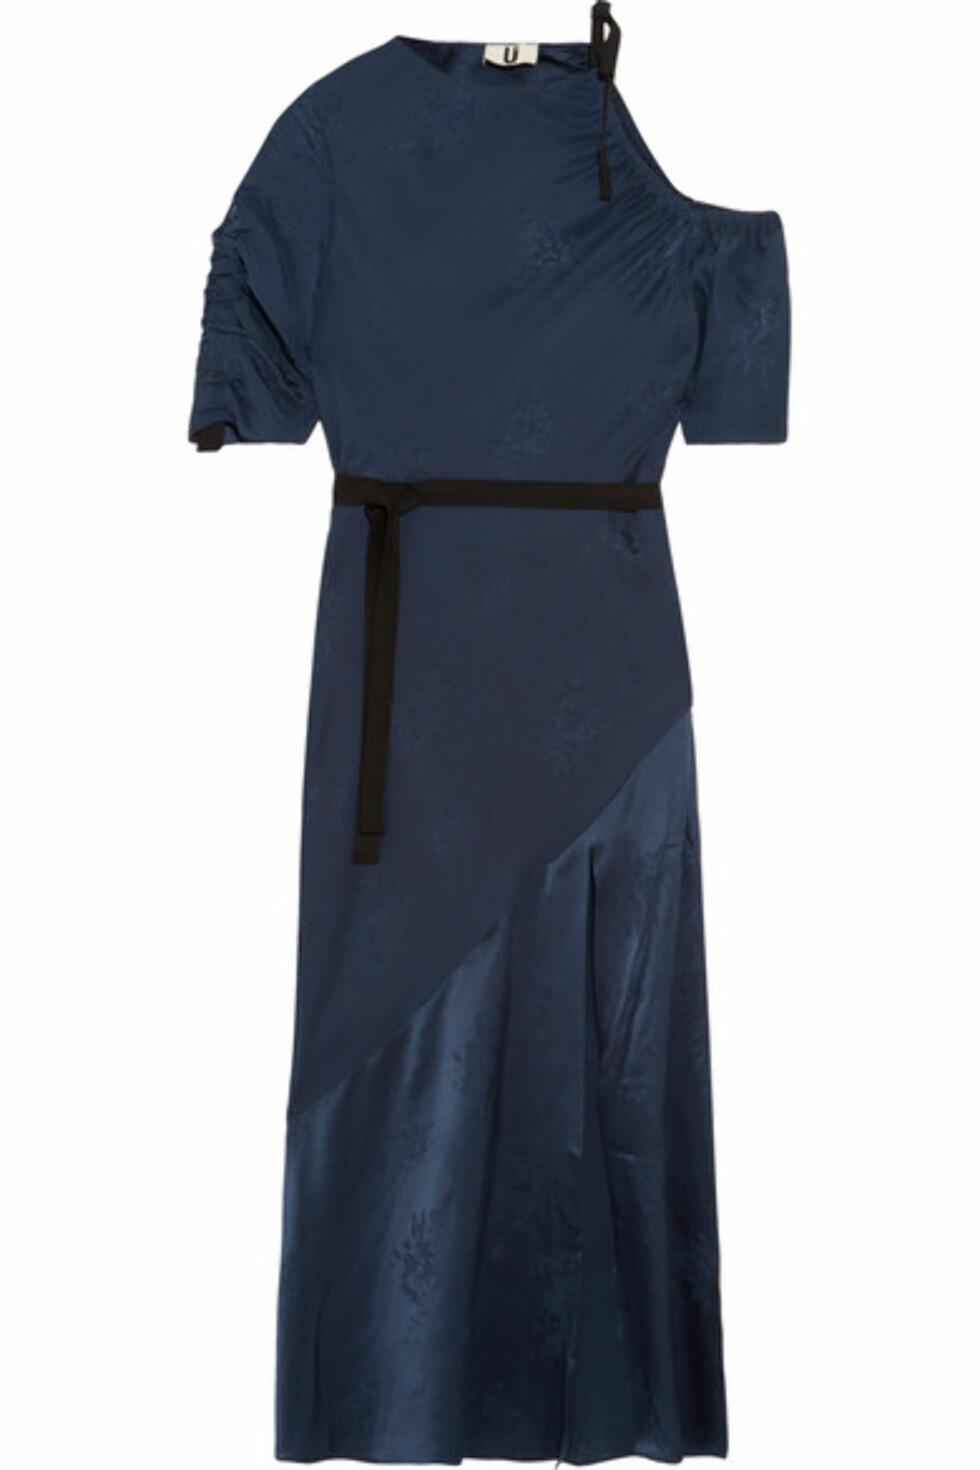 Kjole fra Topshop via Net-a-porter.com |3090,-| https://www.net-a-porter.com/no/en/product/904216/topshop_unique/lambeth-cutout-silk-jacquard-midi-dress